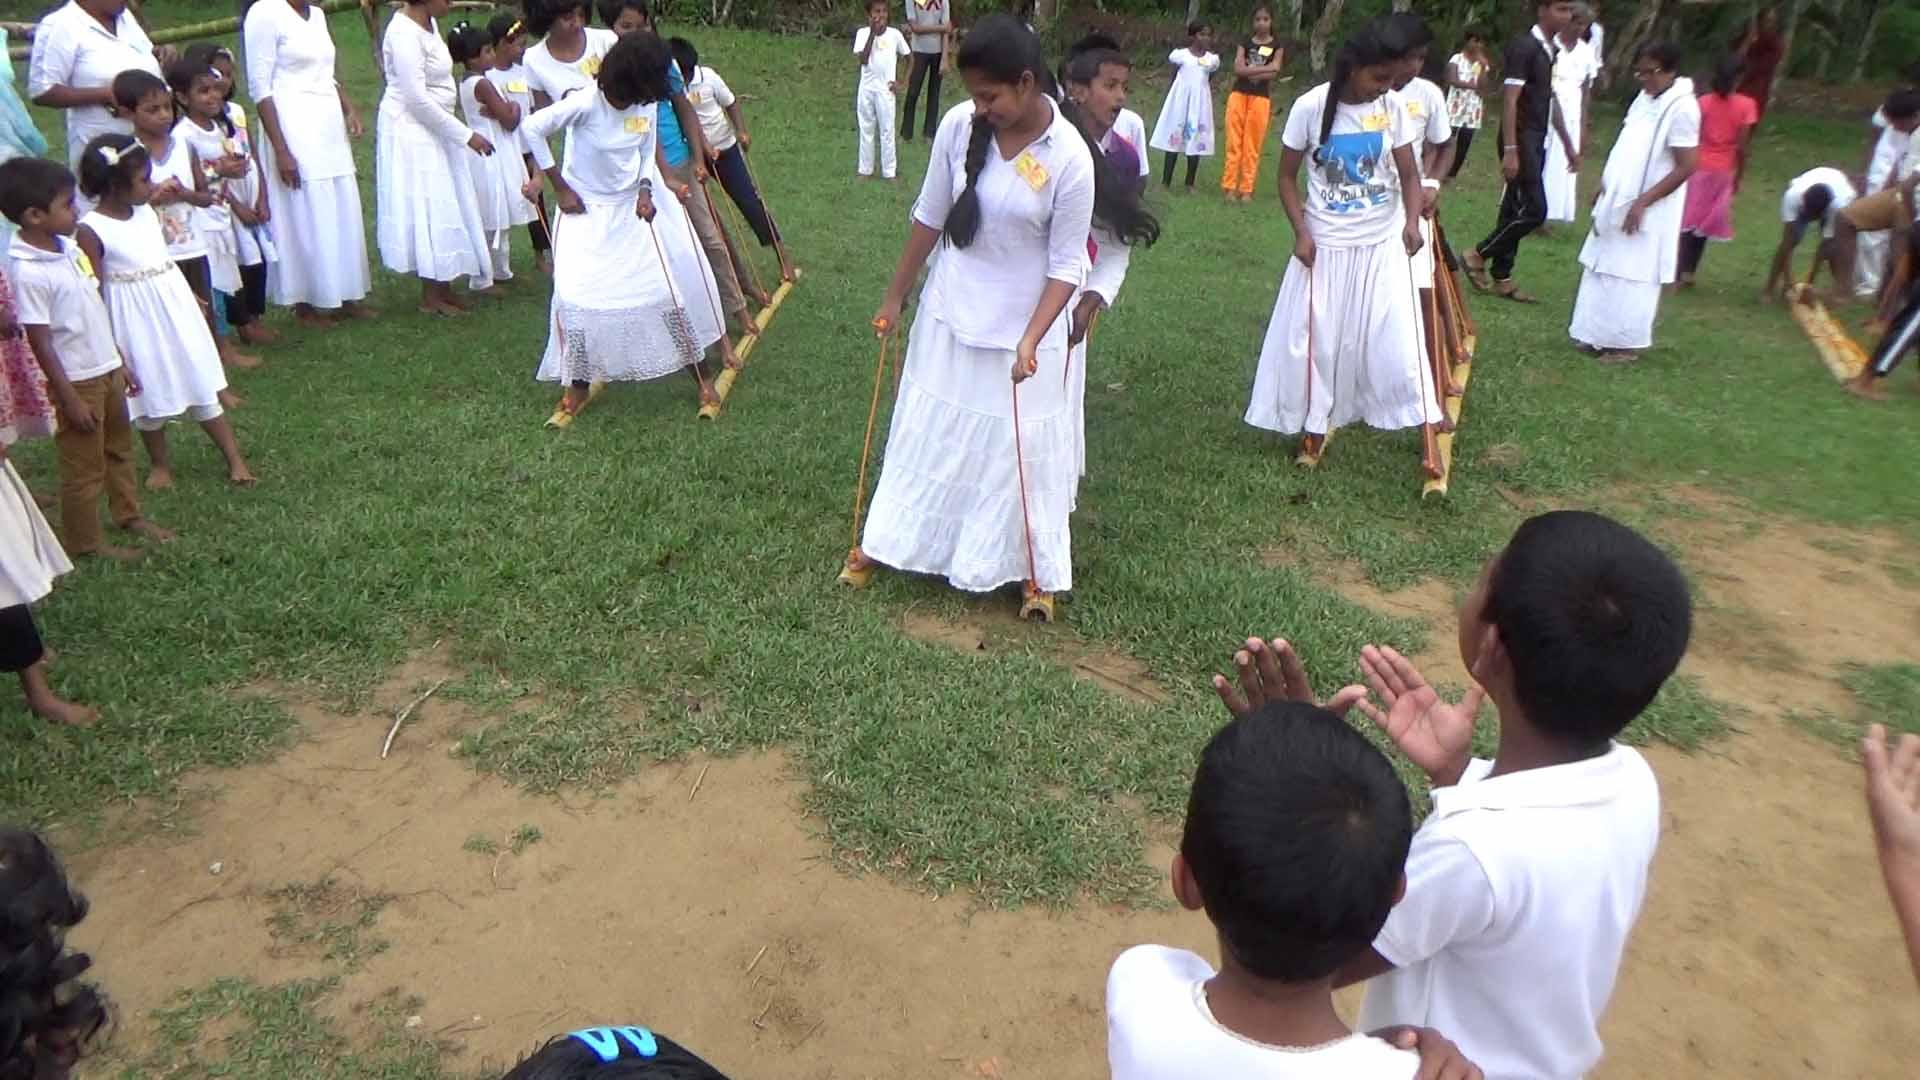 Sati Pasala Mindfulness Camp at Meethirigala Kanishta Vidyalaya-mindful games (17)